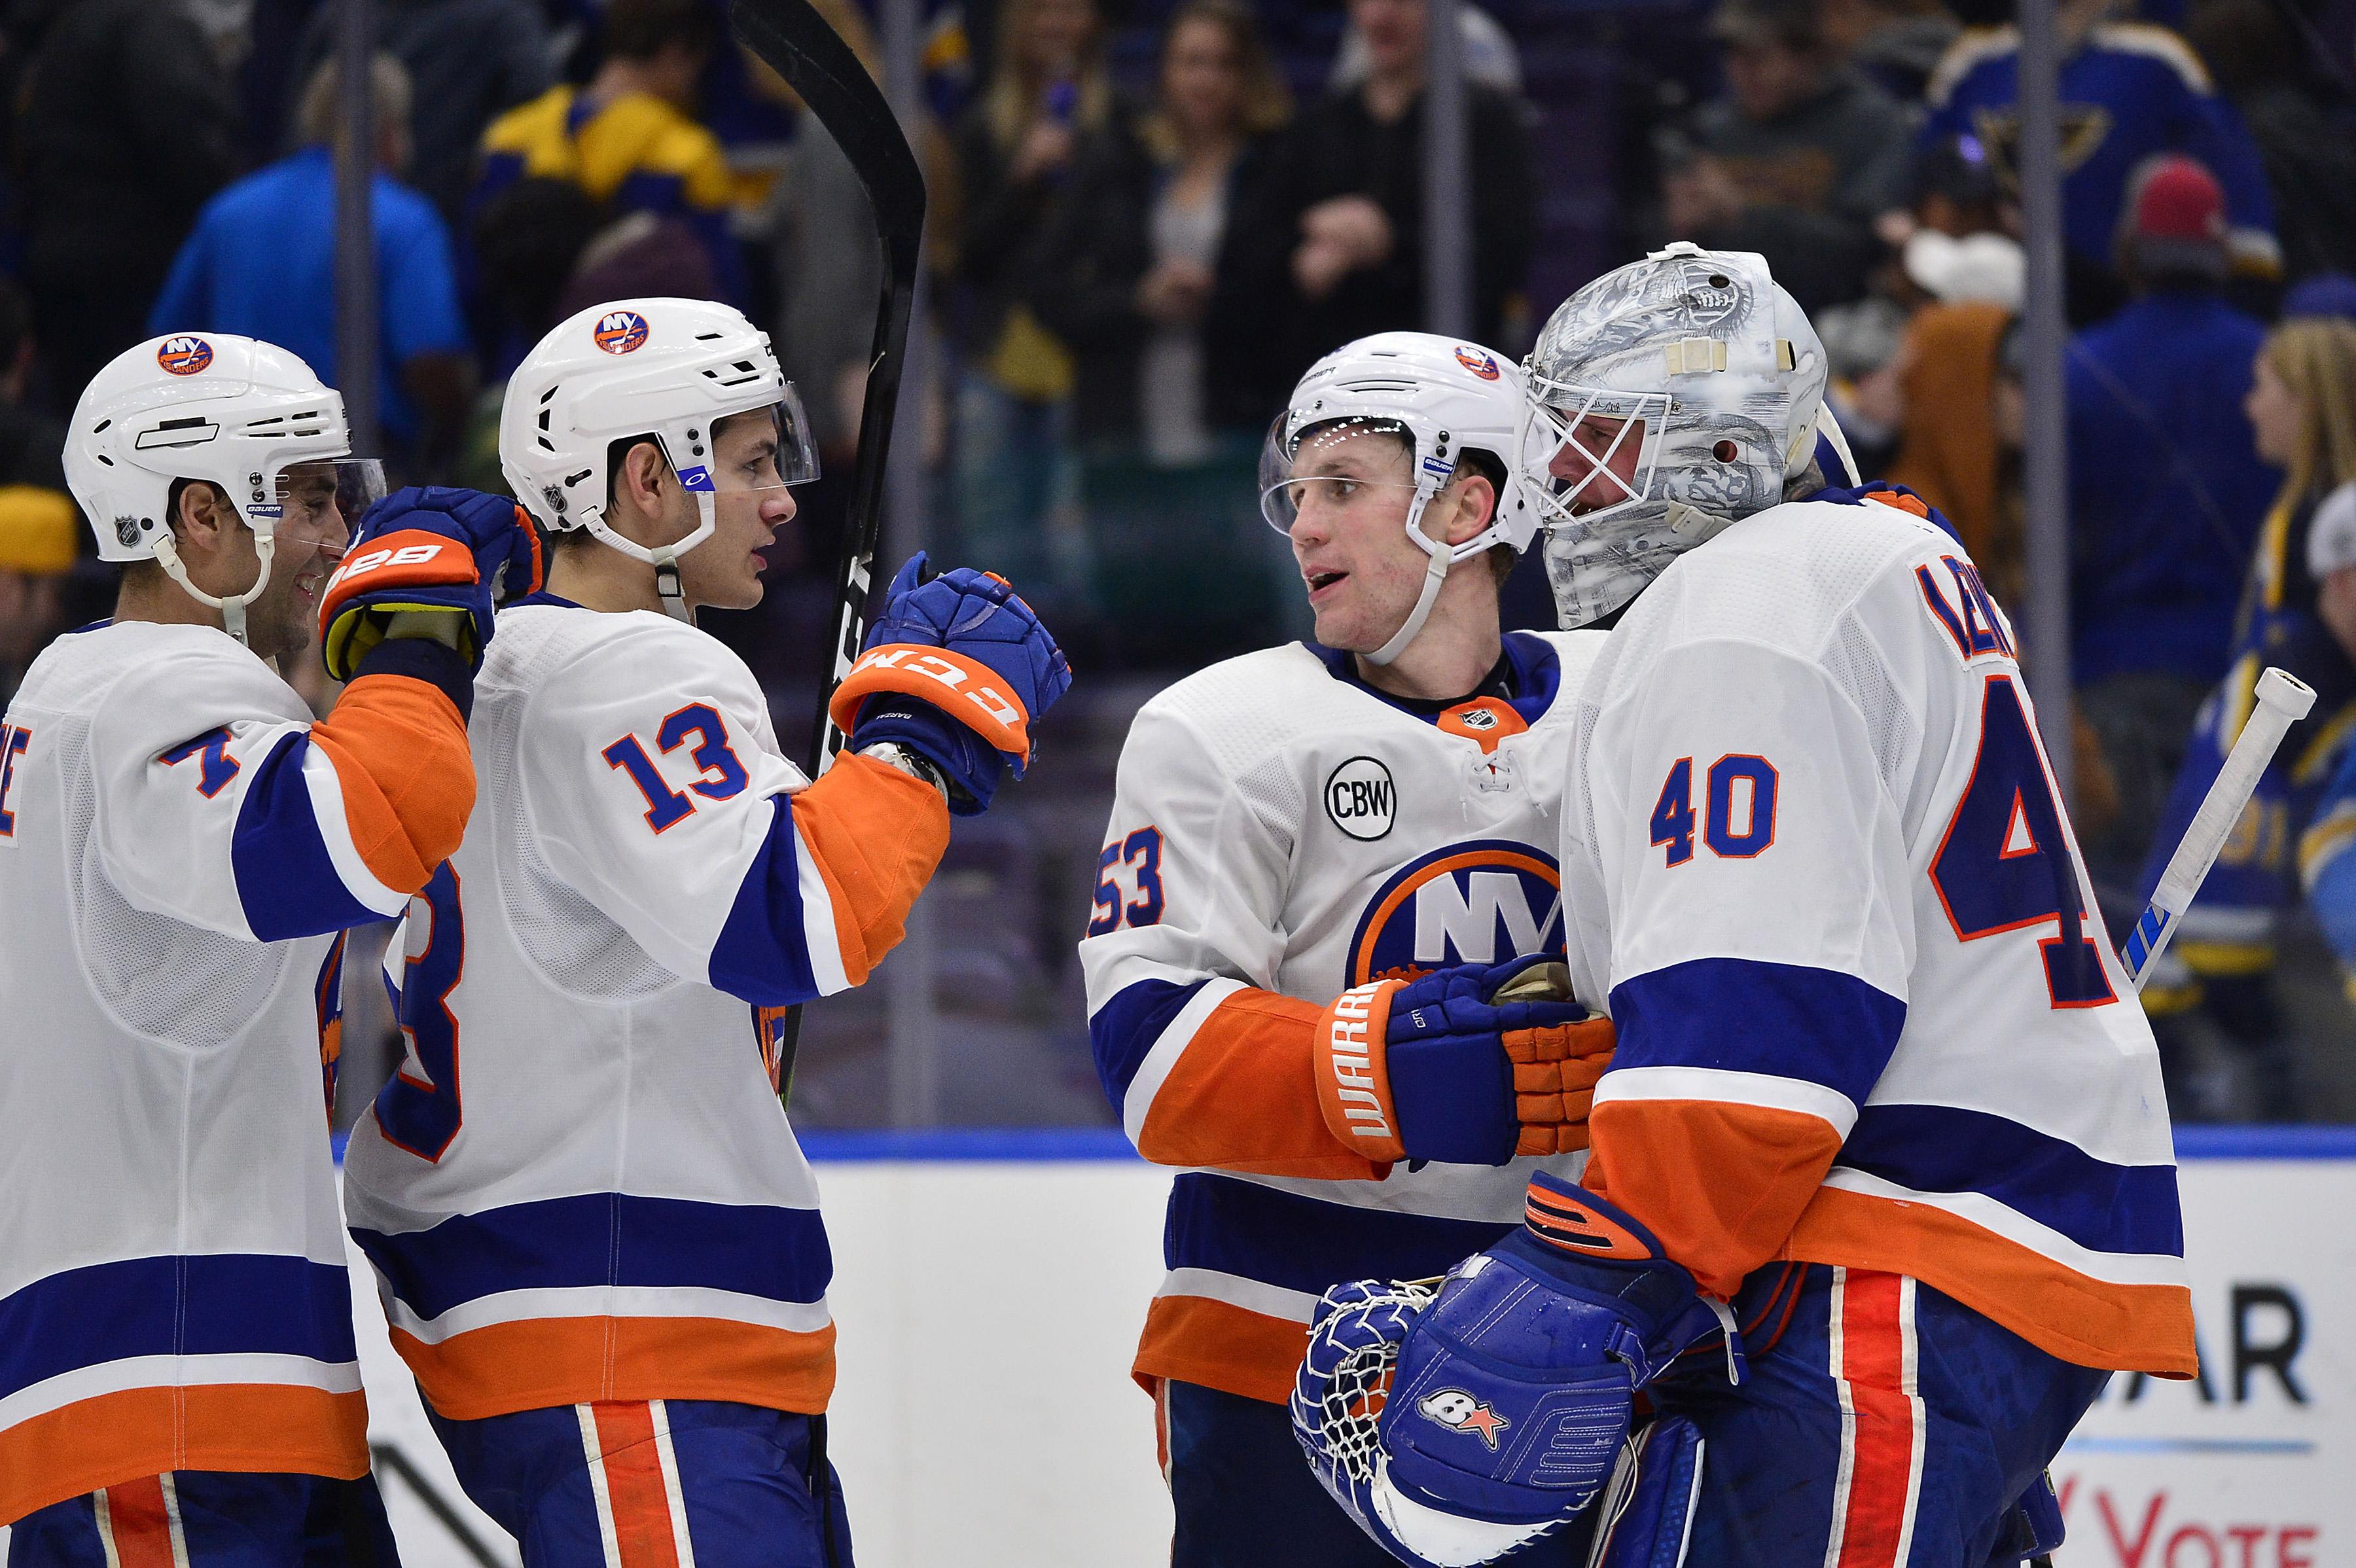 Islanders escape St. Louis with 4-3 win over Blues to extend winning streak